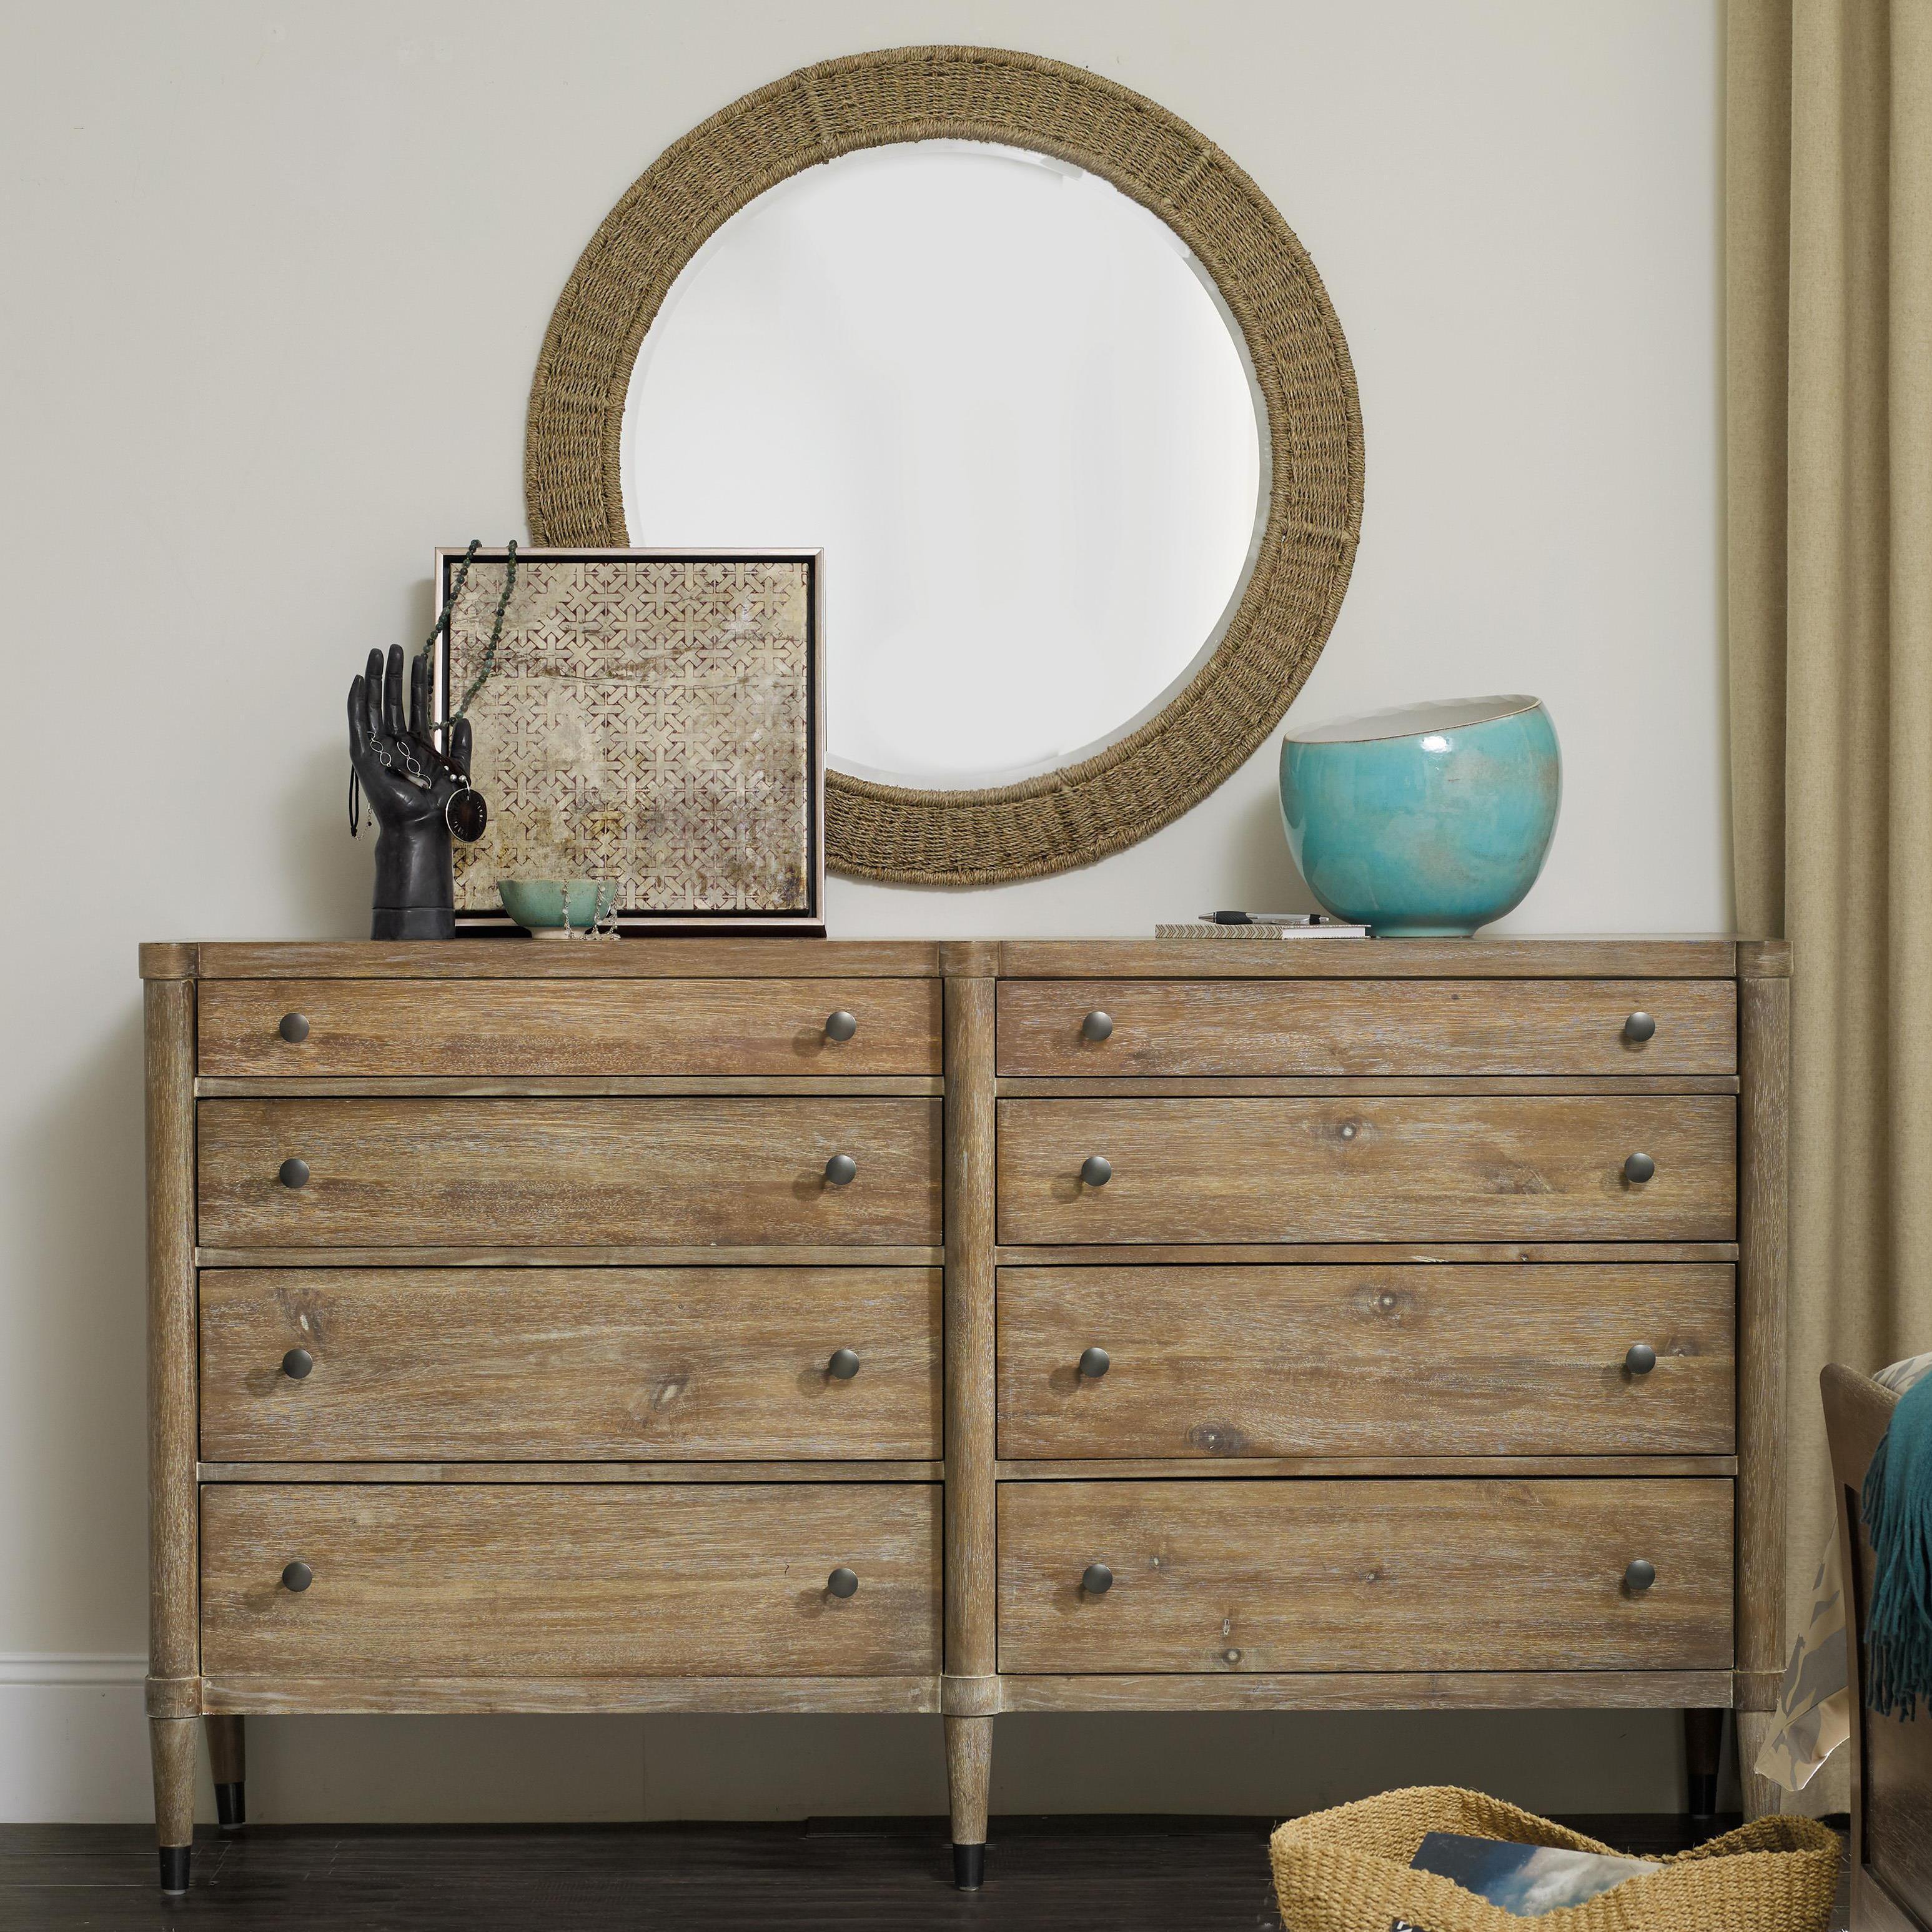 Hooker Furniture Studio 7H Annika Dresser and Harmony Mirror Set - Item Number: 5382-90002+7